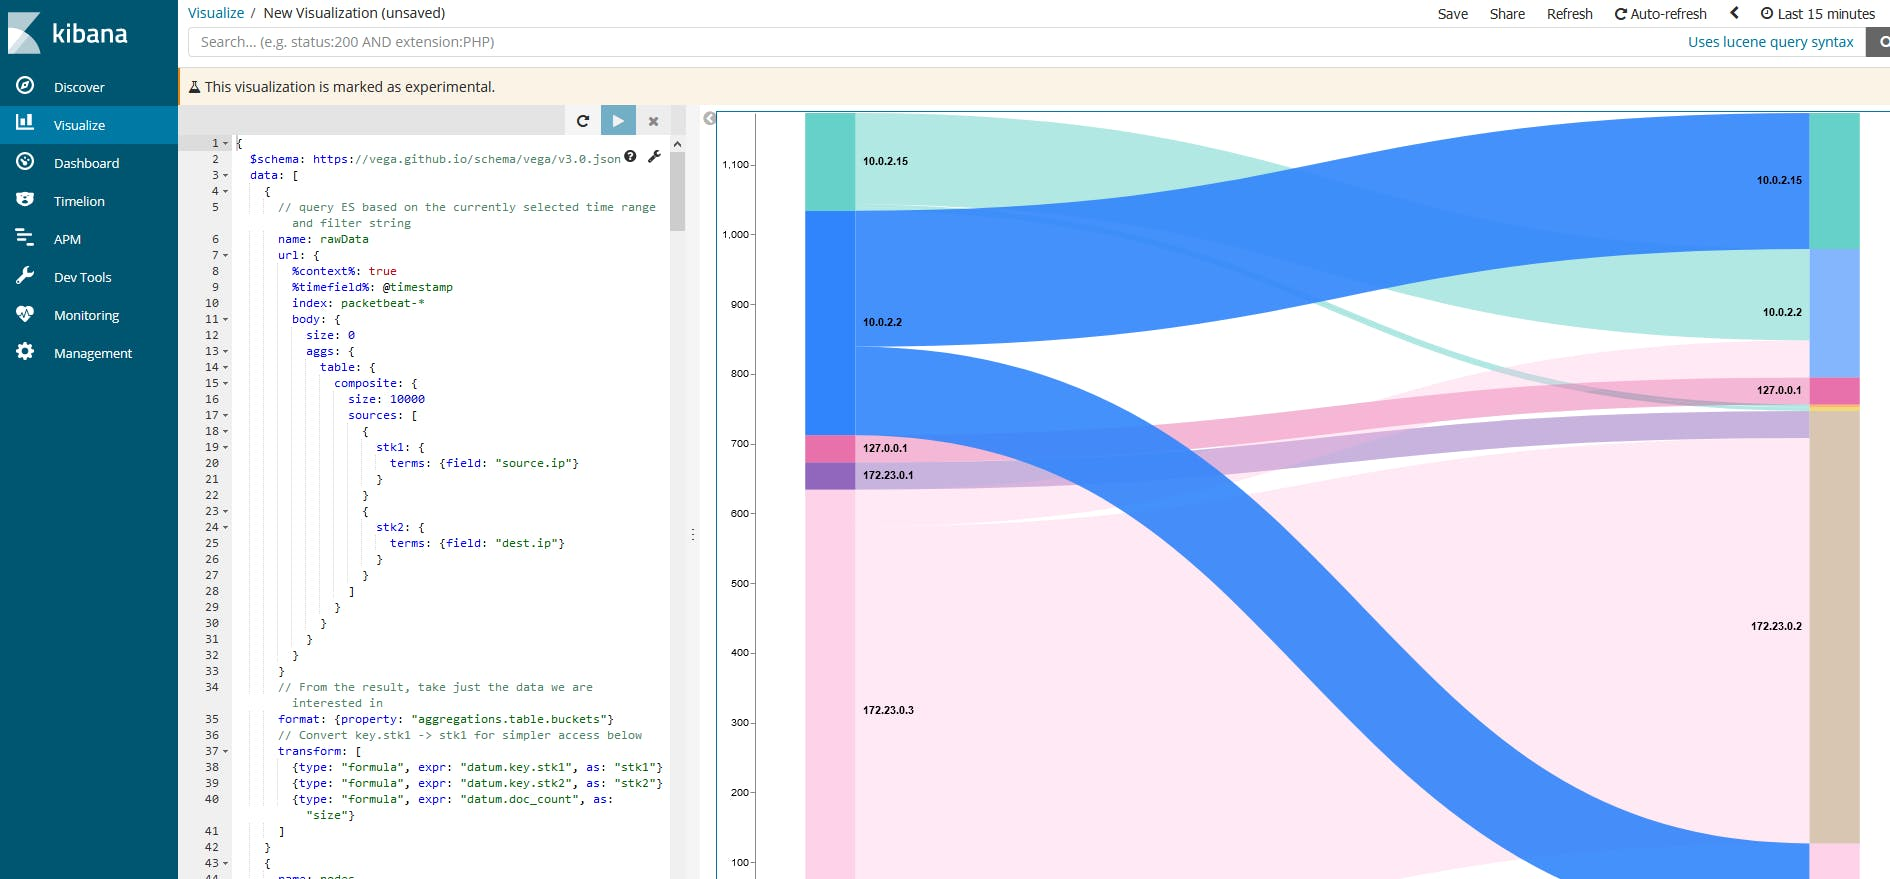 PacketbeatのFlow情報をSankey Diagramで可視化する(Kibana6 2+ Vega